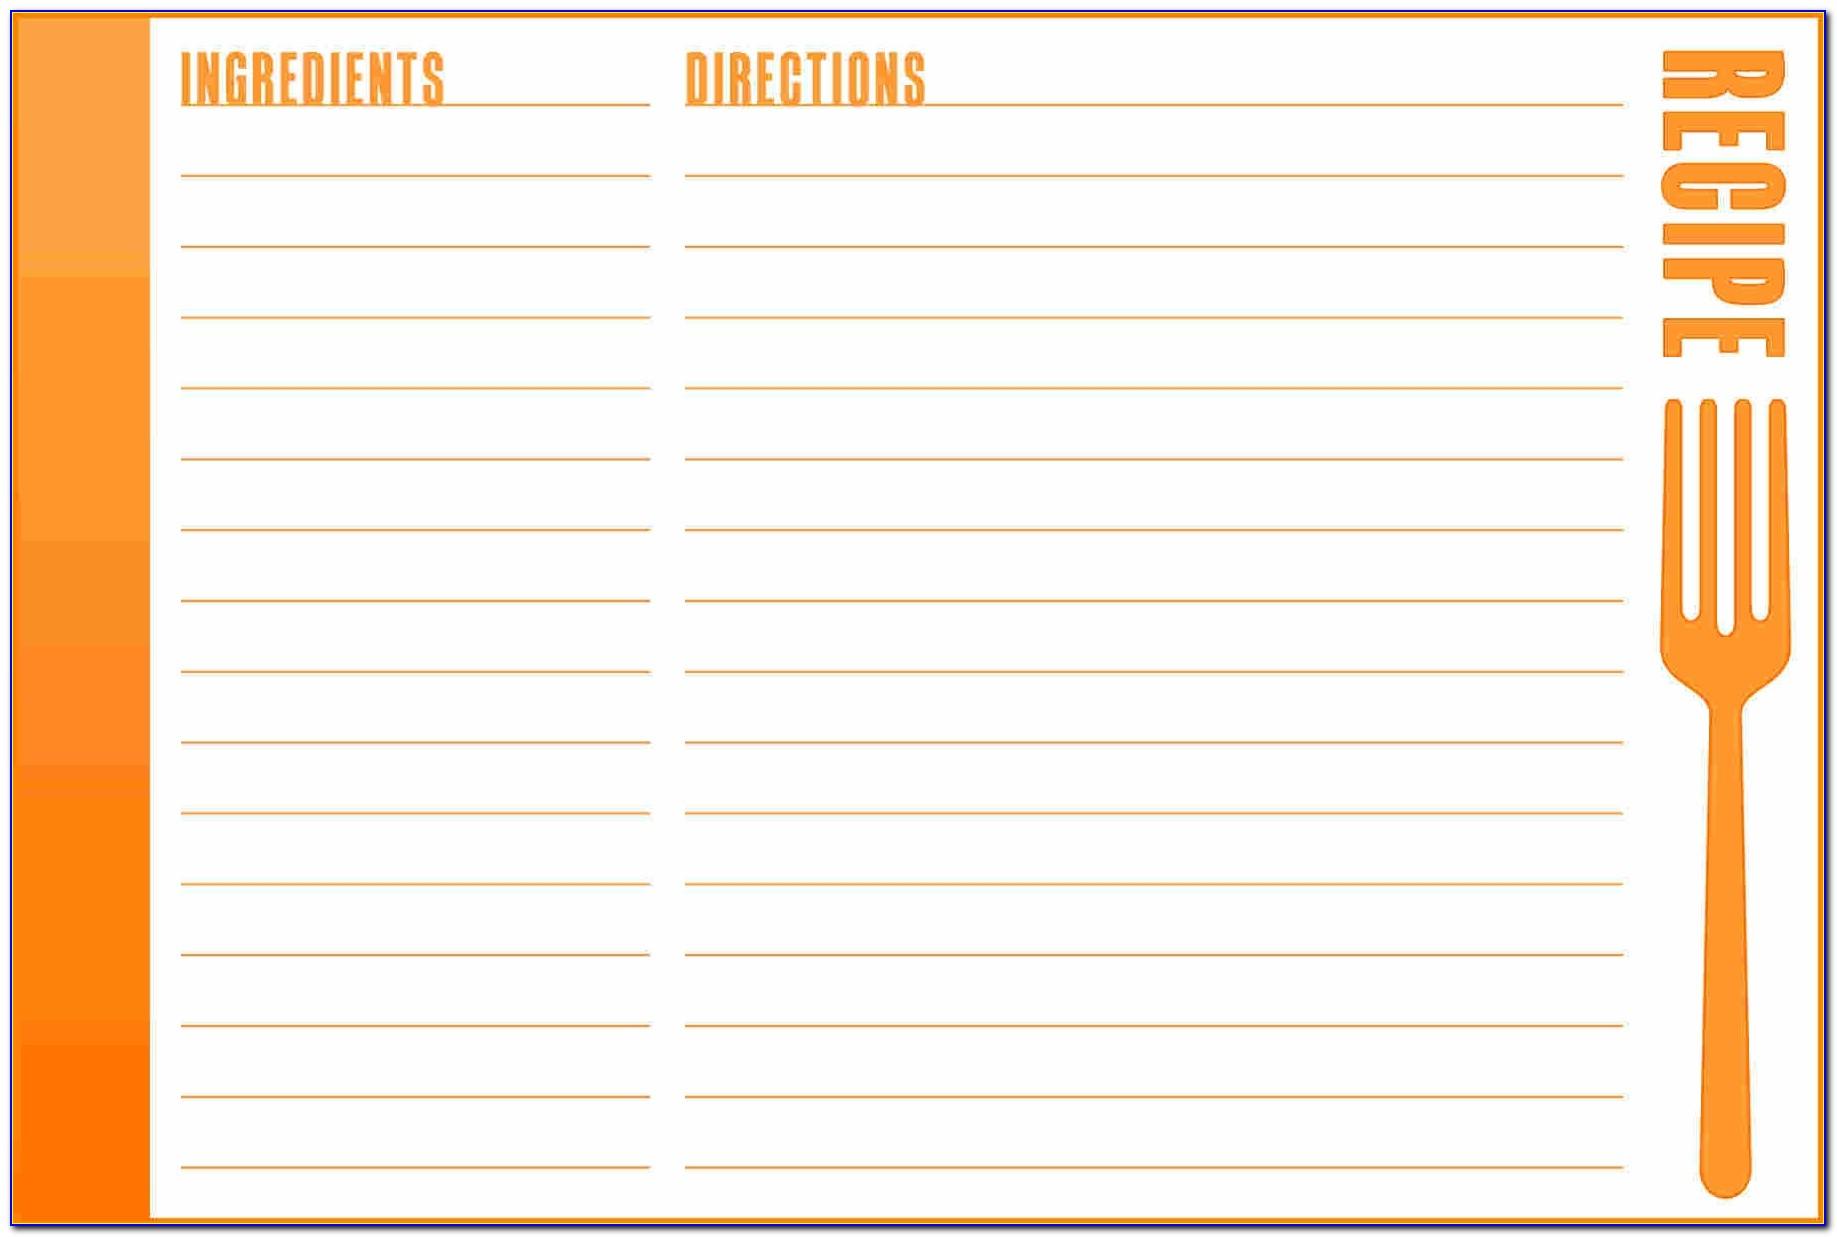 Free Editable Recipe Card Templates For Microsoft Word 4x6